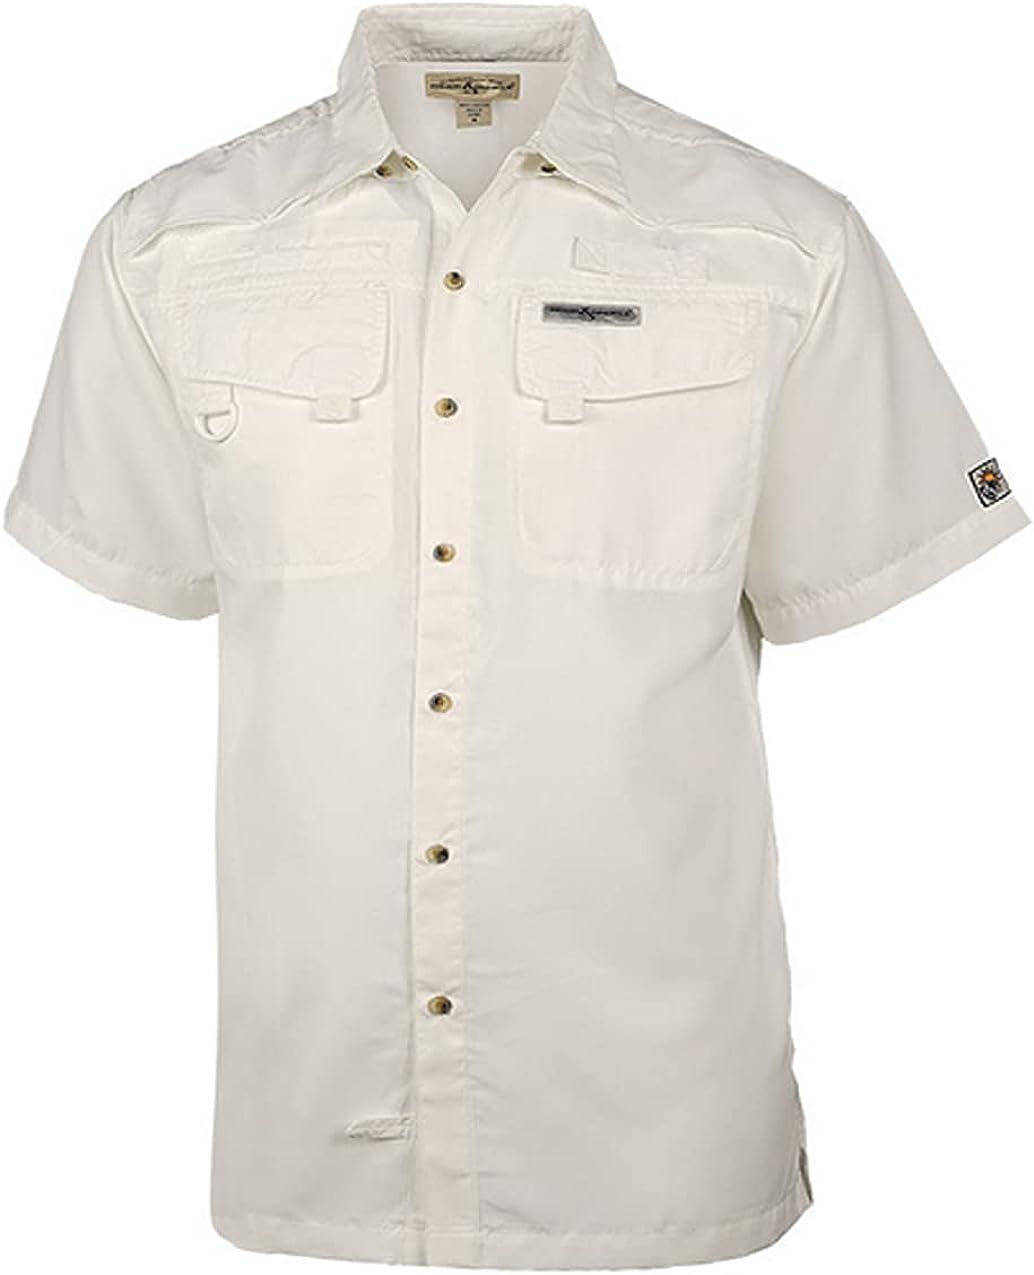 Hook & Tackle Men's Seacliff 2.0 | Short Sleeve | Vented | UV Sun Protection | Performance Fishing Shirt